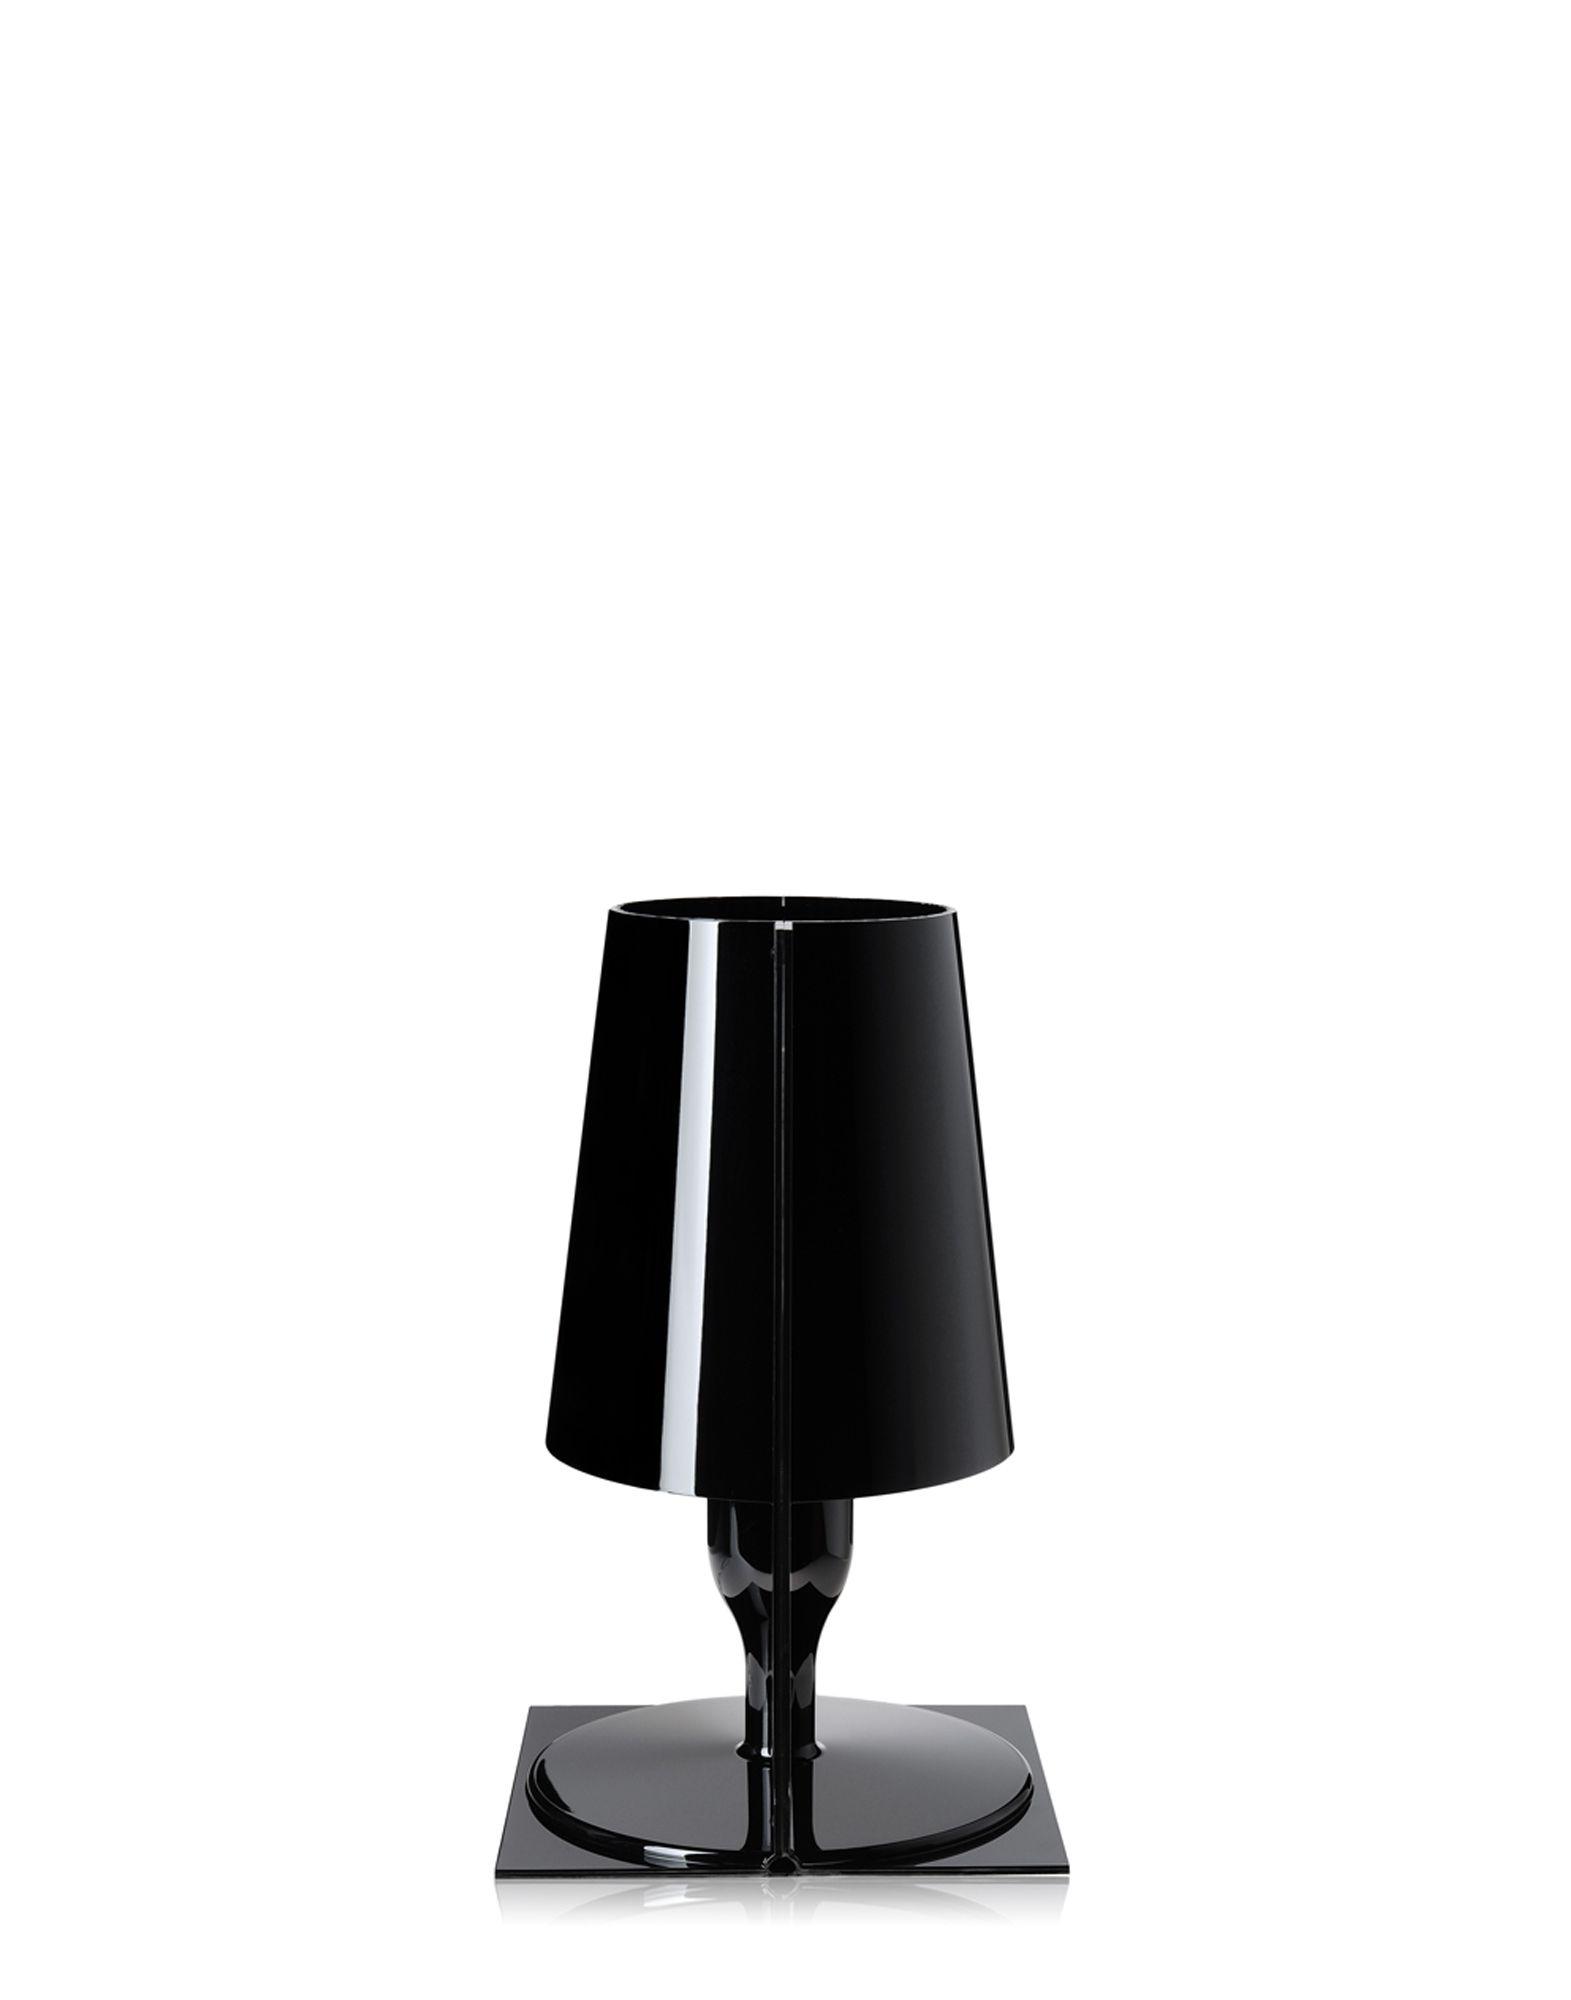 Kartell lampada da tavolo take nero newformsdesign for Iba arredamenti